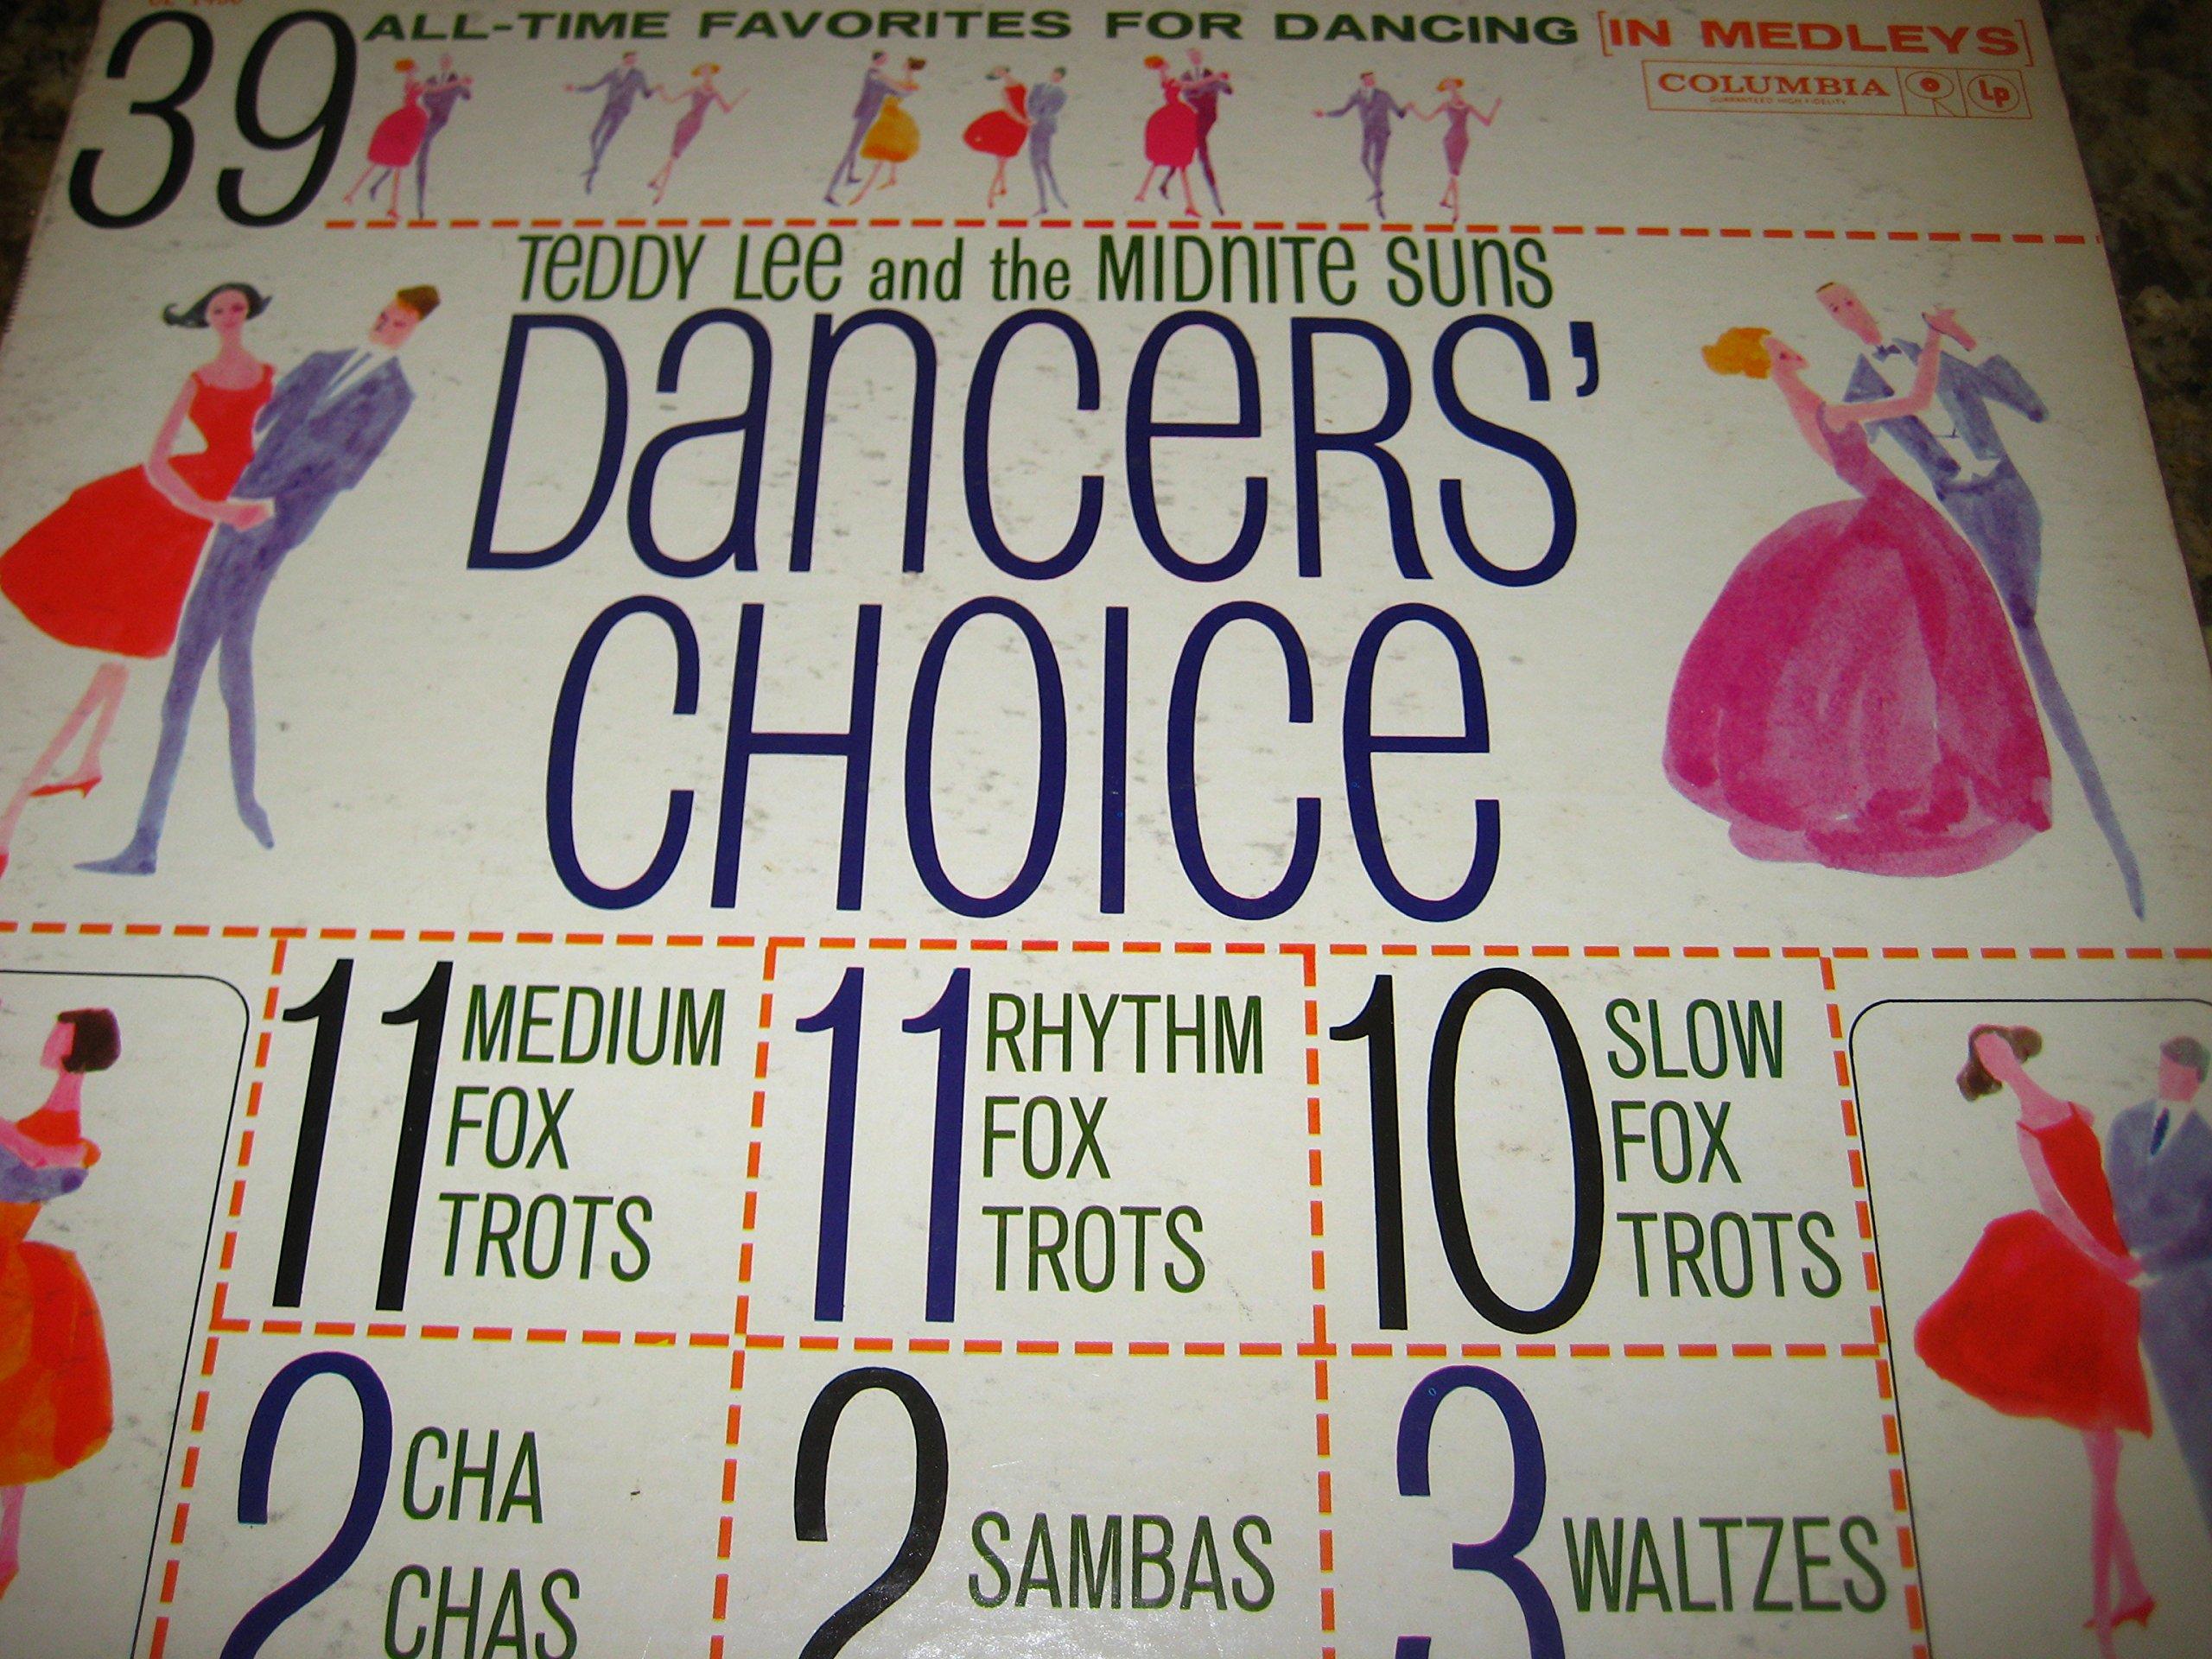 Dancers' Choice: 39 All-Time Favorites for Dancing [Cha Cha, Fox Trot, Samba]